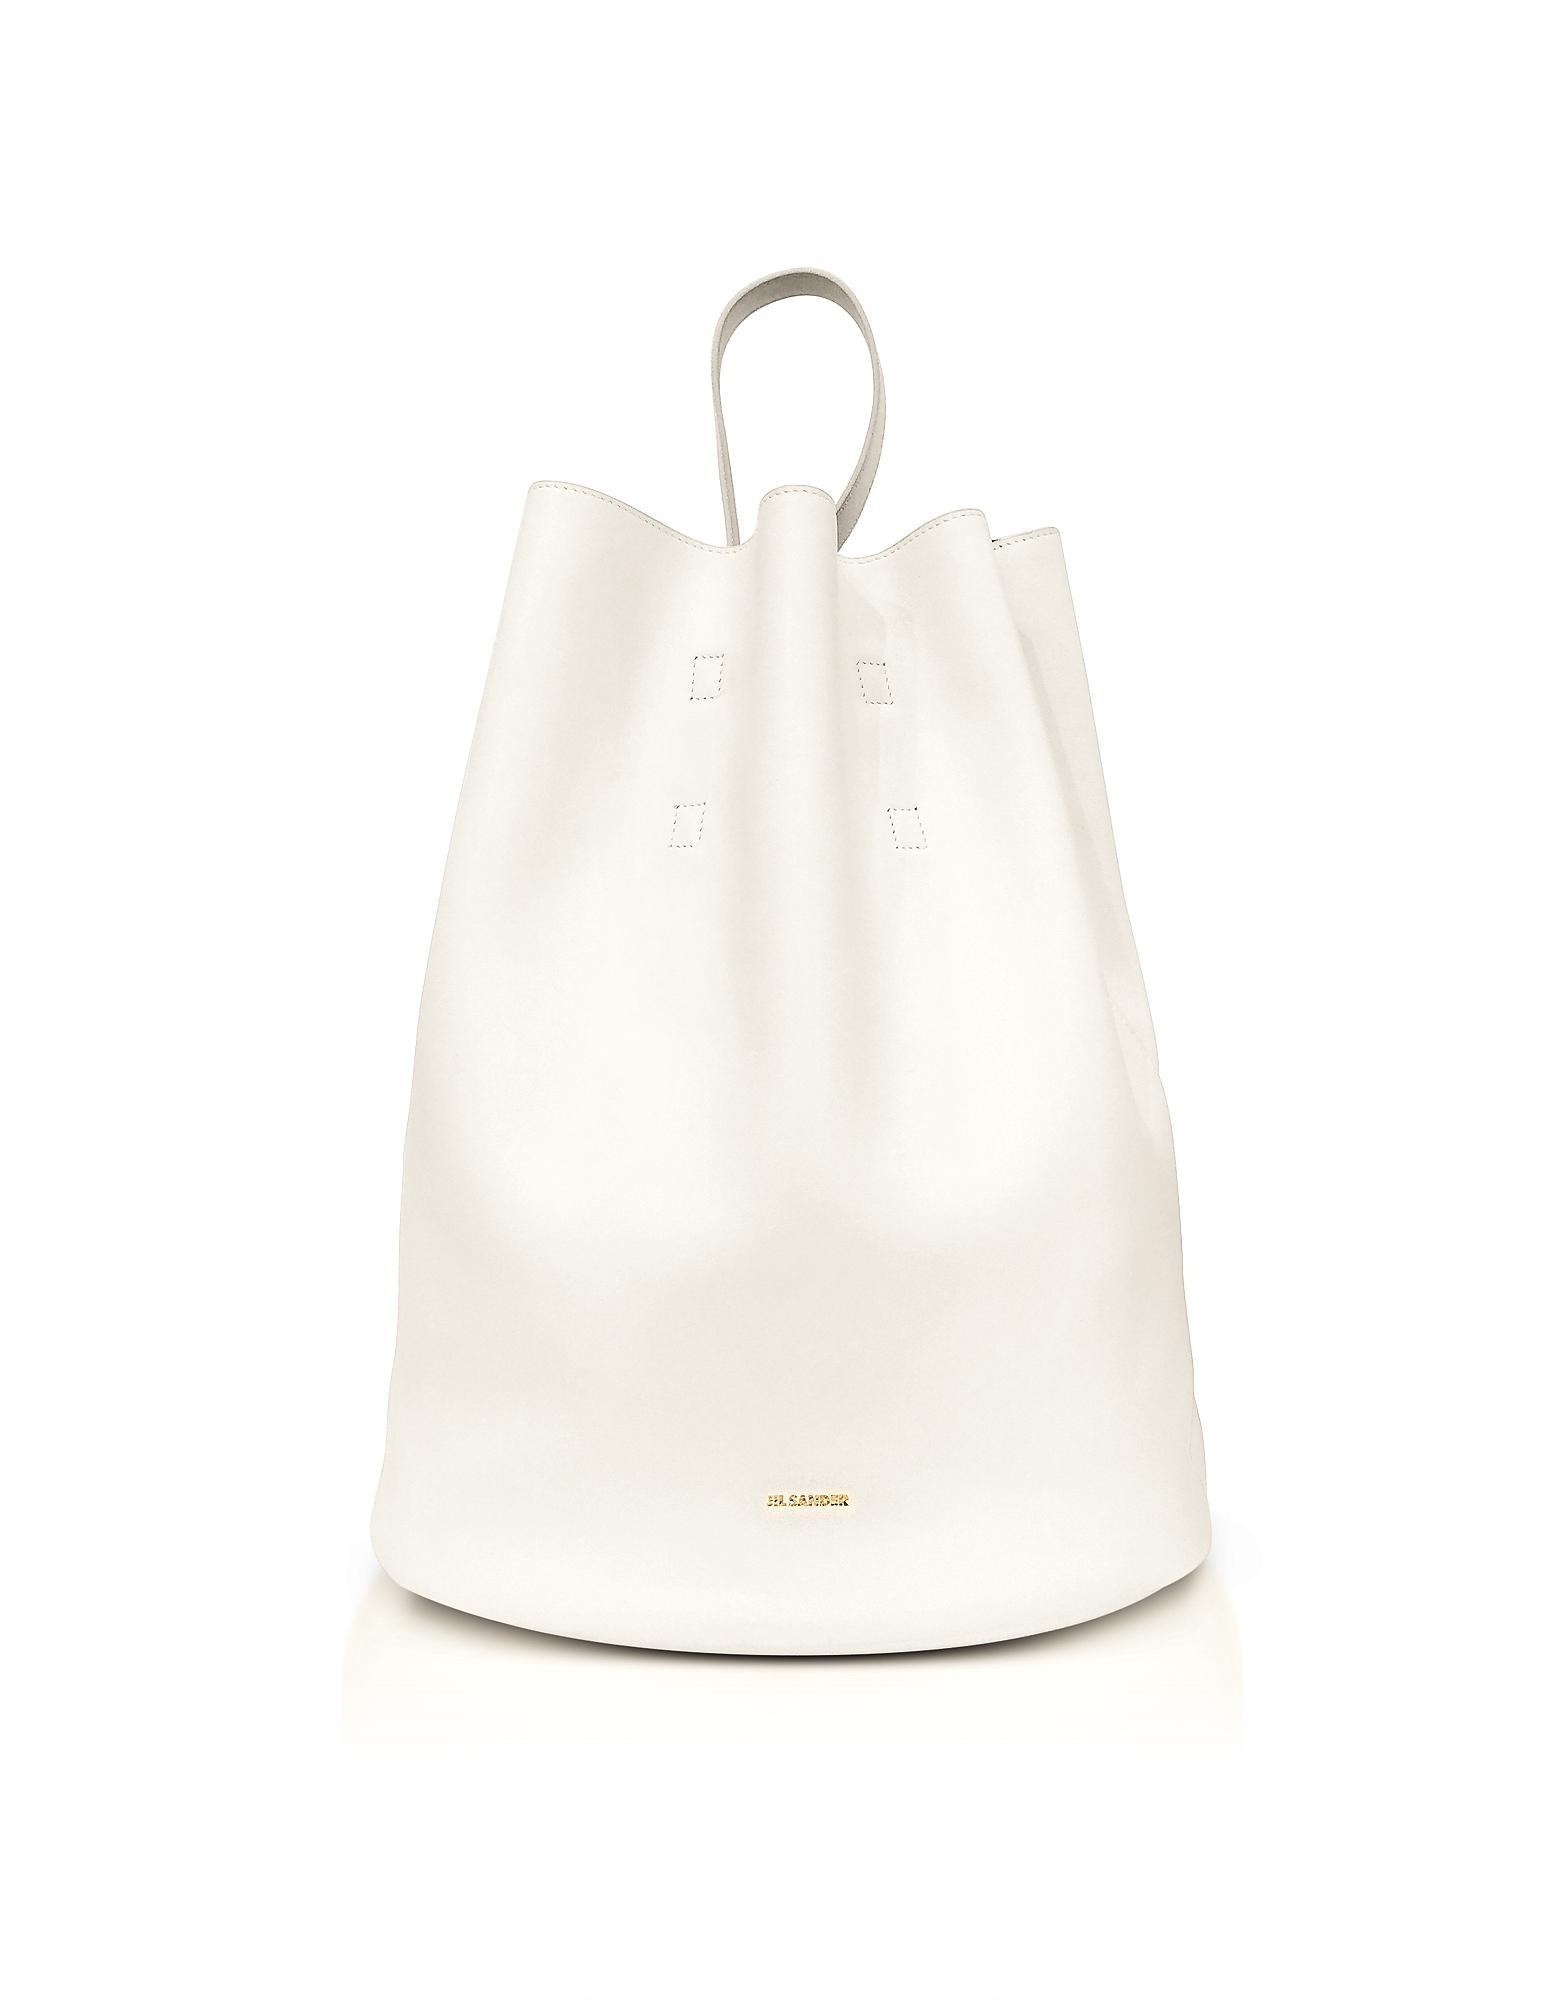 Jil Sander Open White Leather Bucket Bag